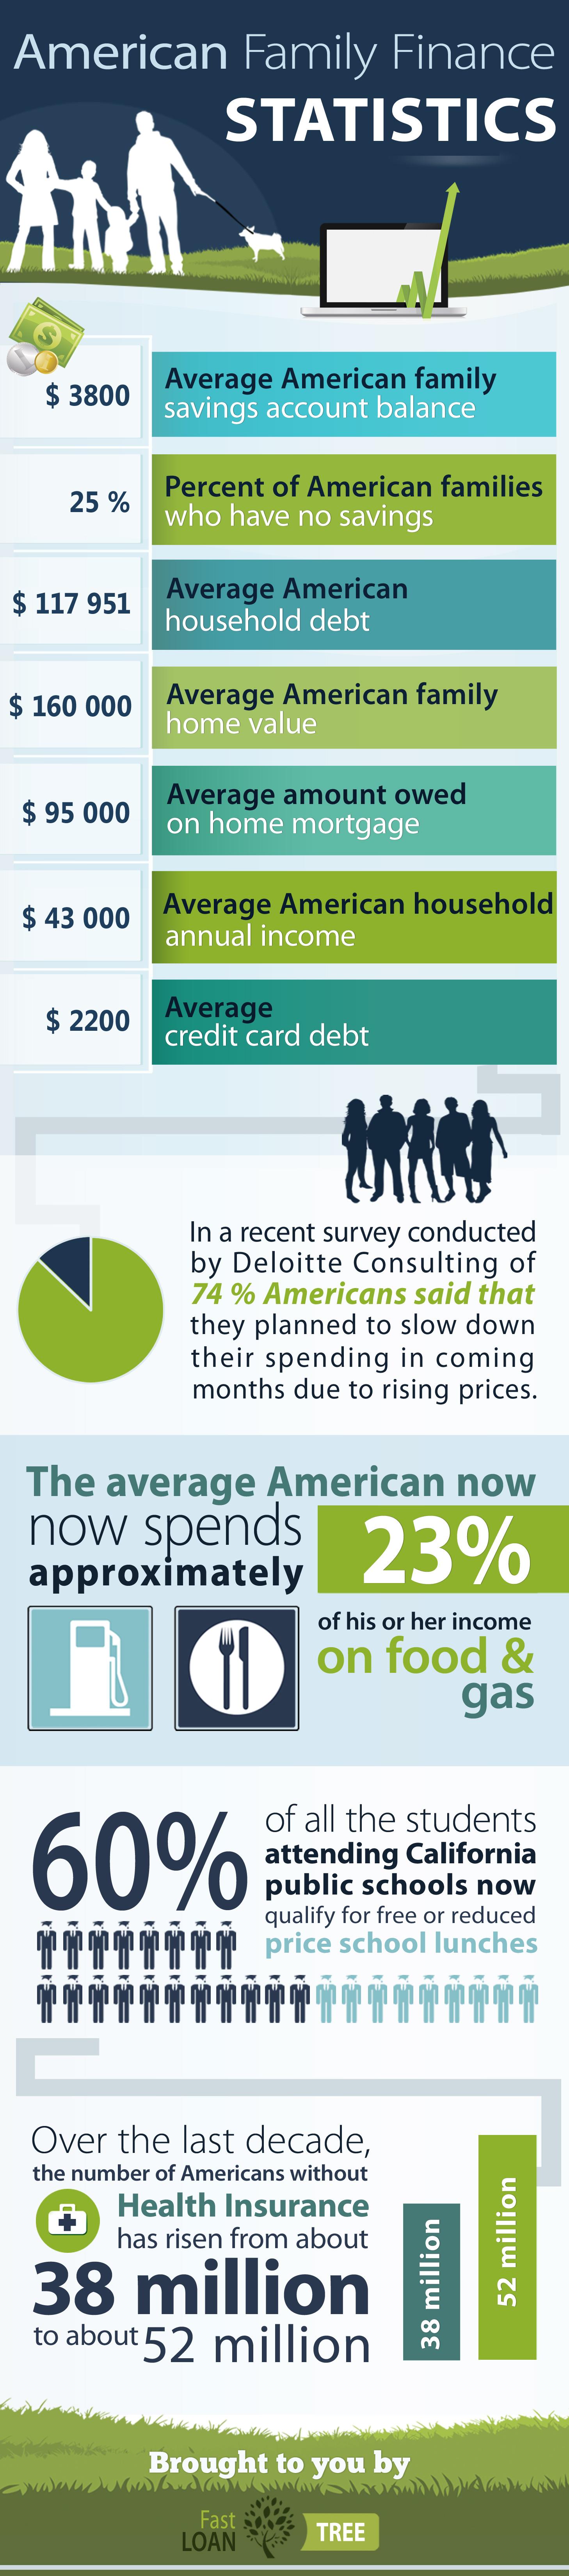 american_family_finance_statistics